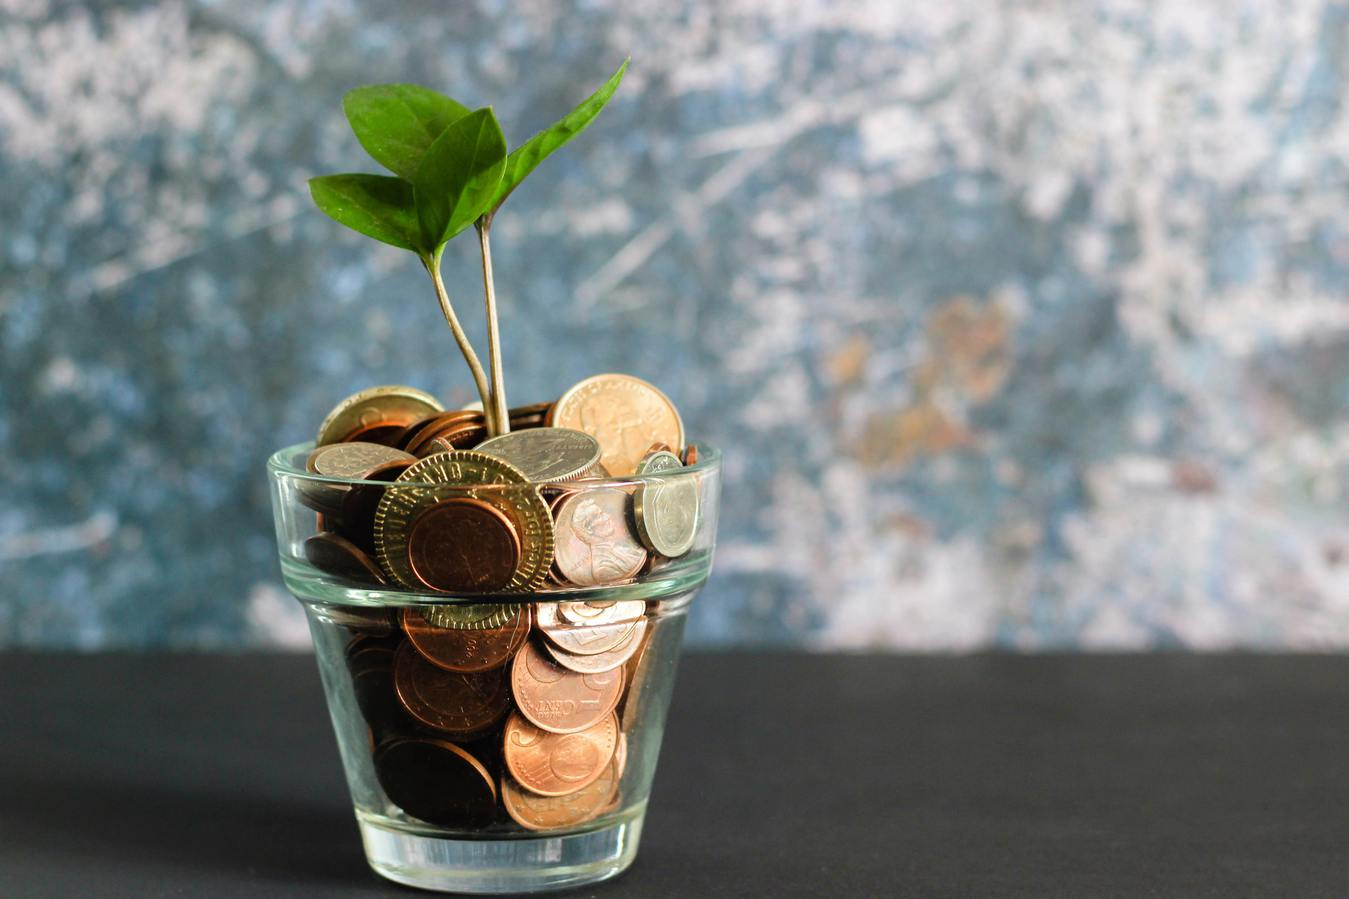 Tanaman tumbuh dari pot berisi uang